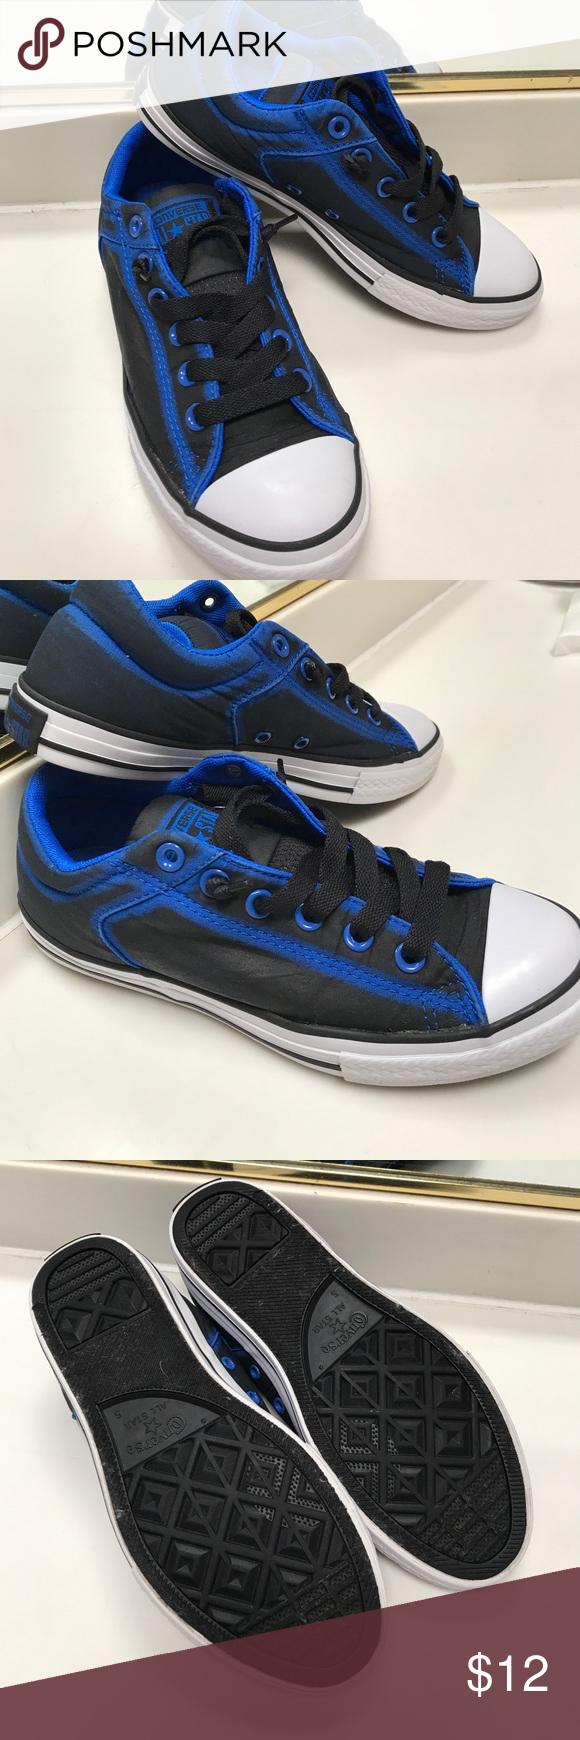 c75c0f60e74e Boys Converse Sneakers Like new!!! boys converse sneakers slip on ...